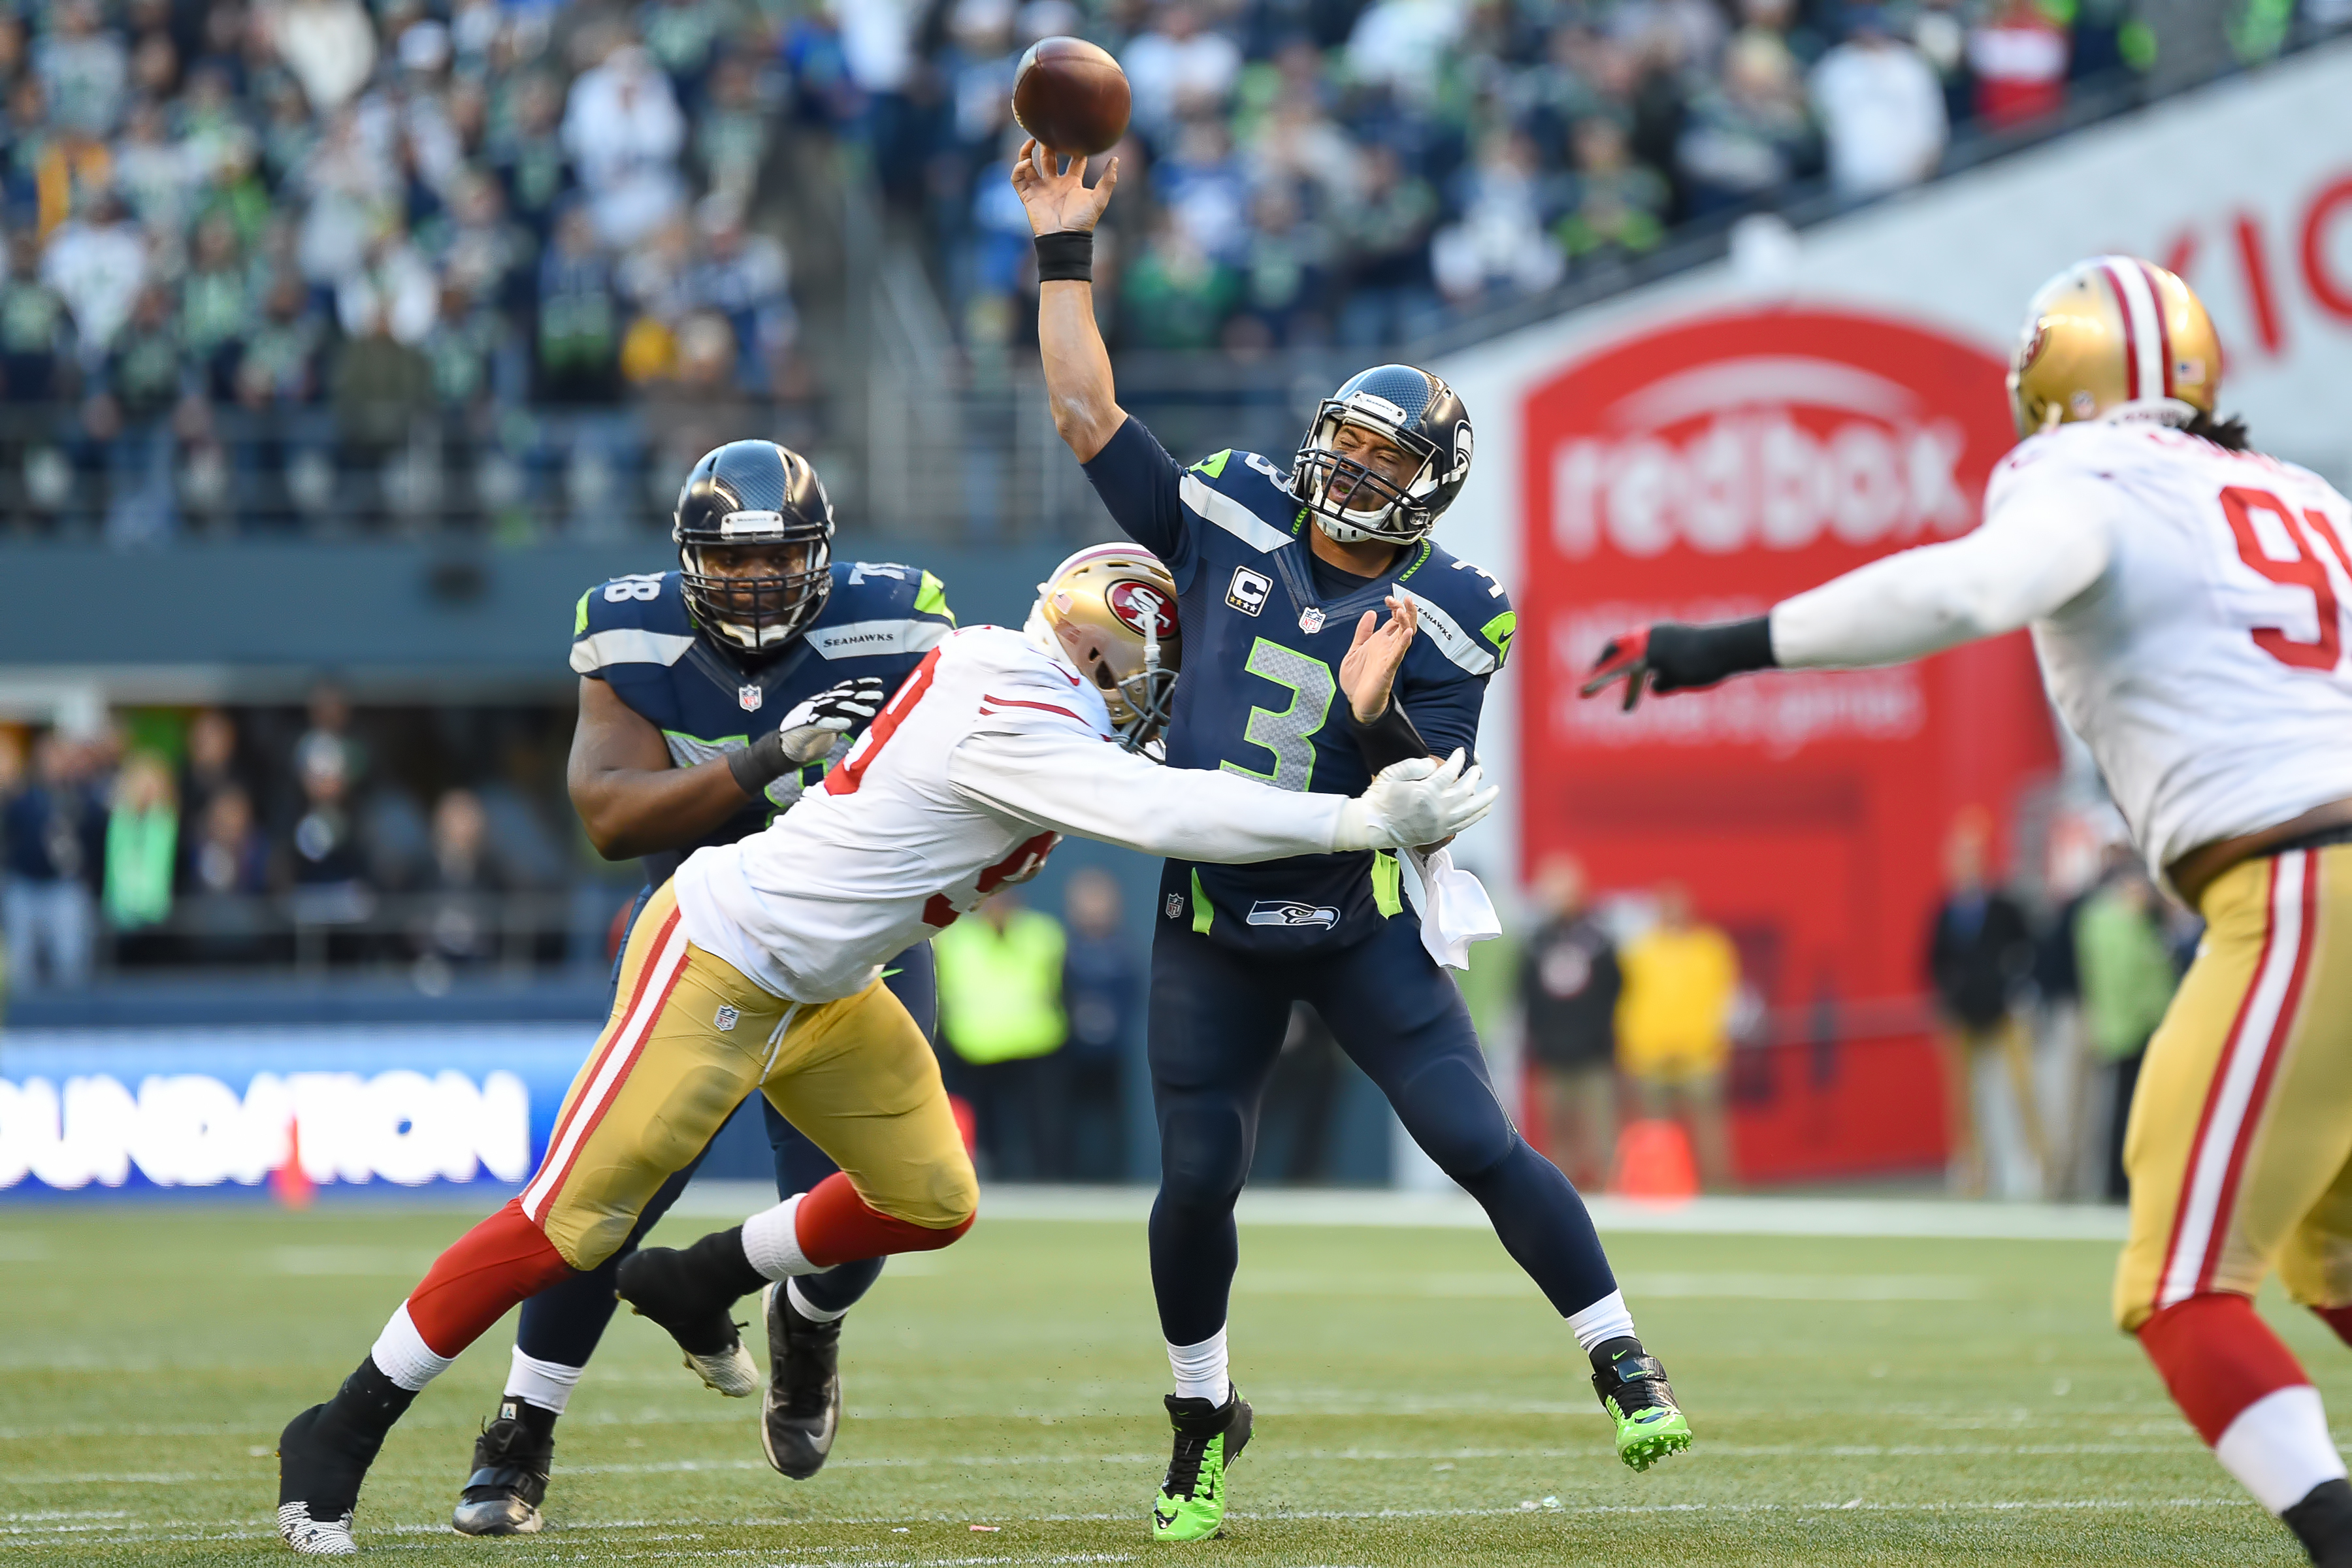 NFL: DEC 14 49ers at Seahawks